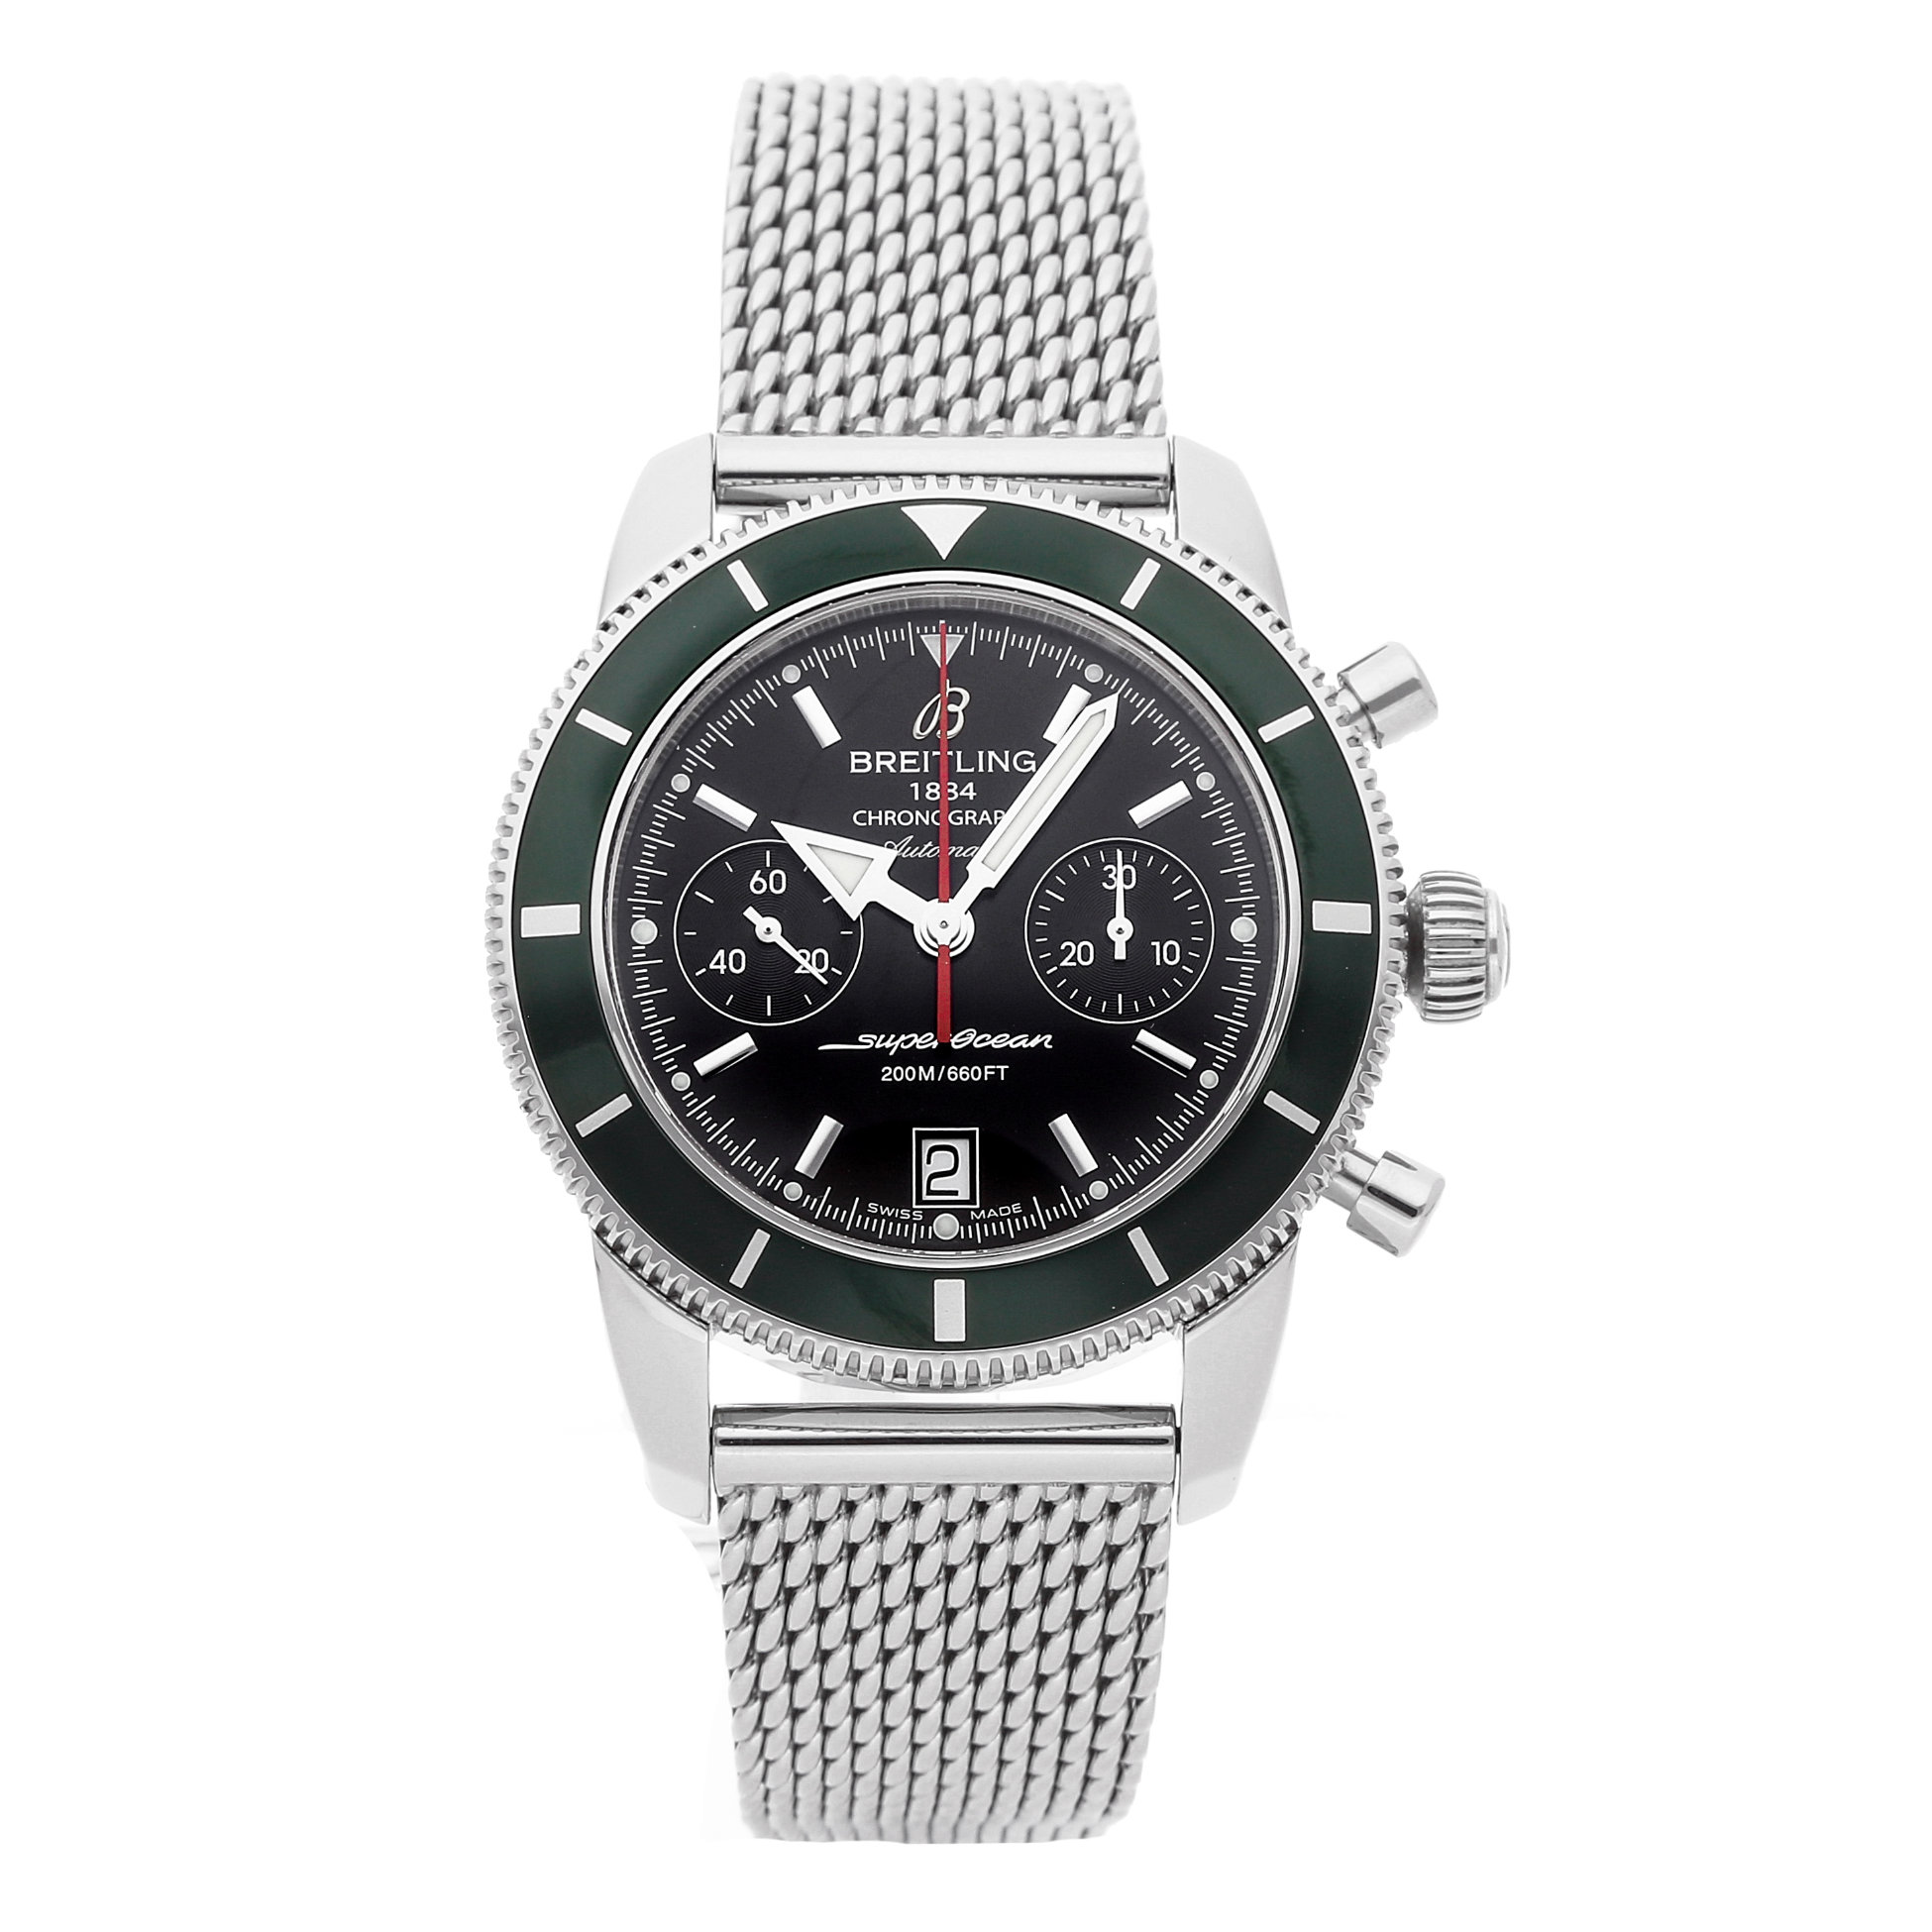 Breitling Superocean Heritage Chronograph via WATCHBOX